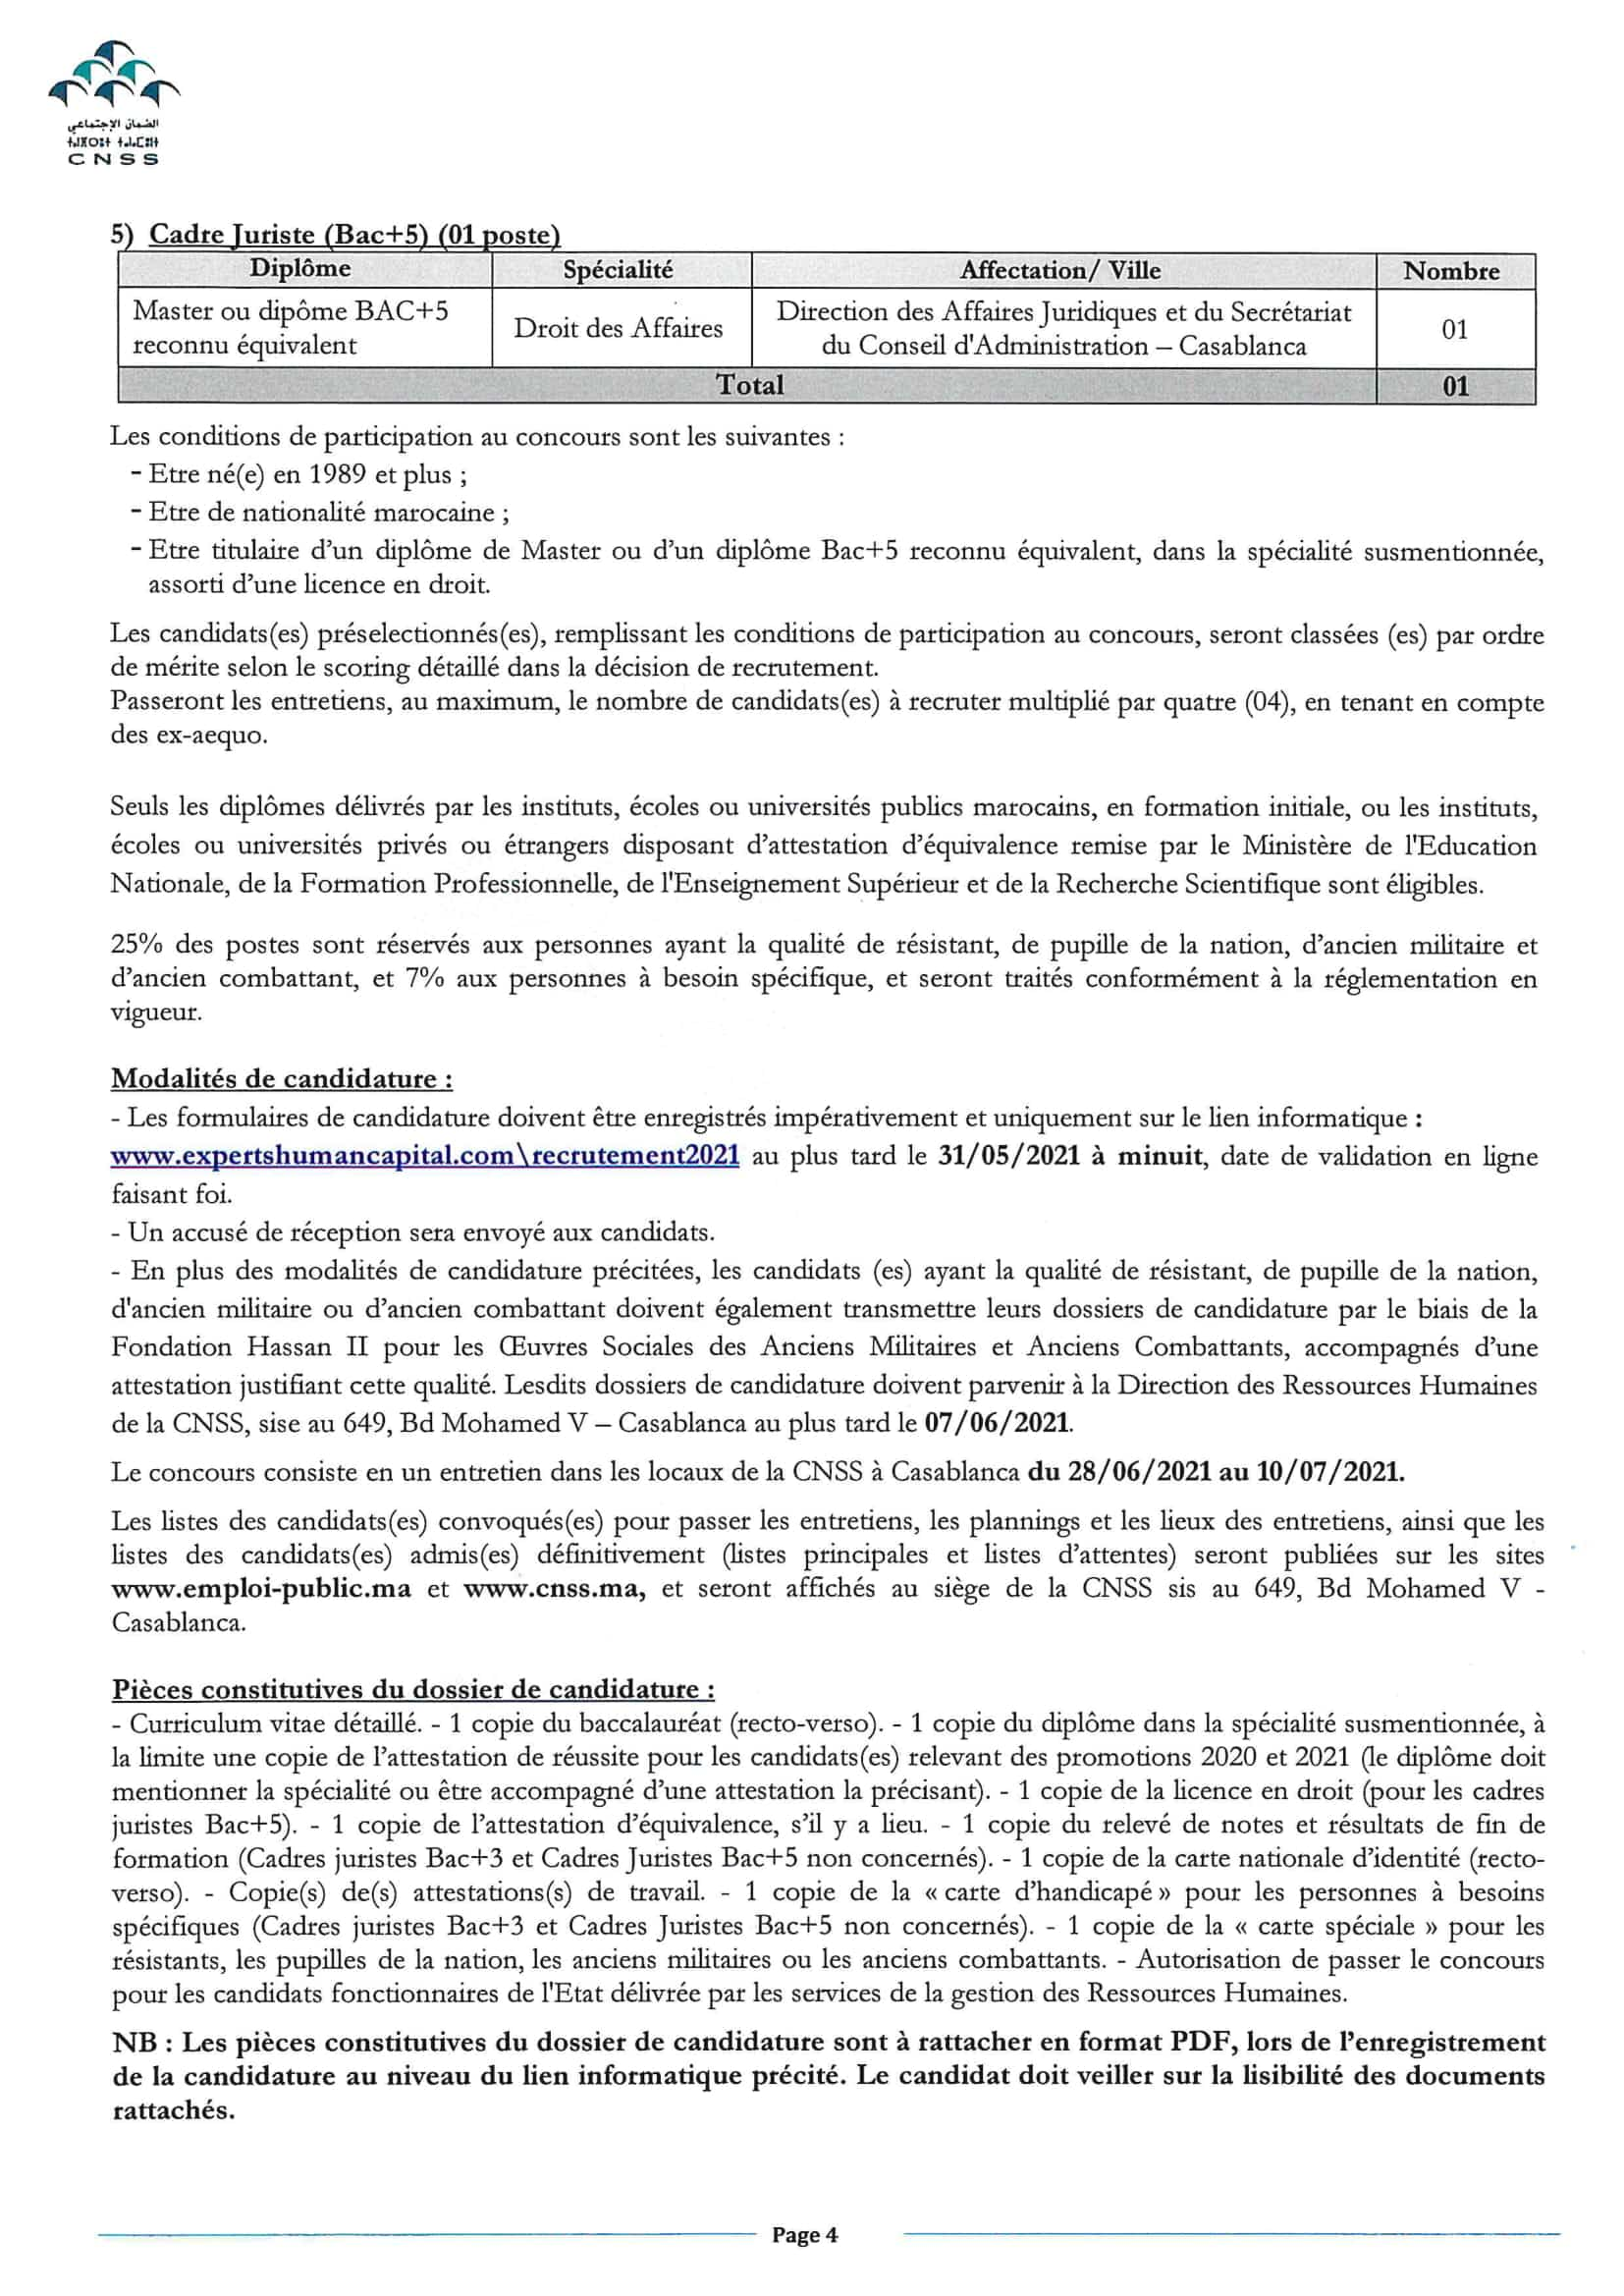 Avis Recrutement Concours CNSS 2021 4